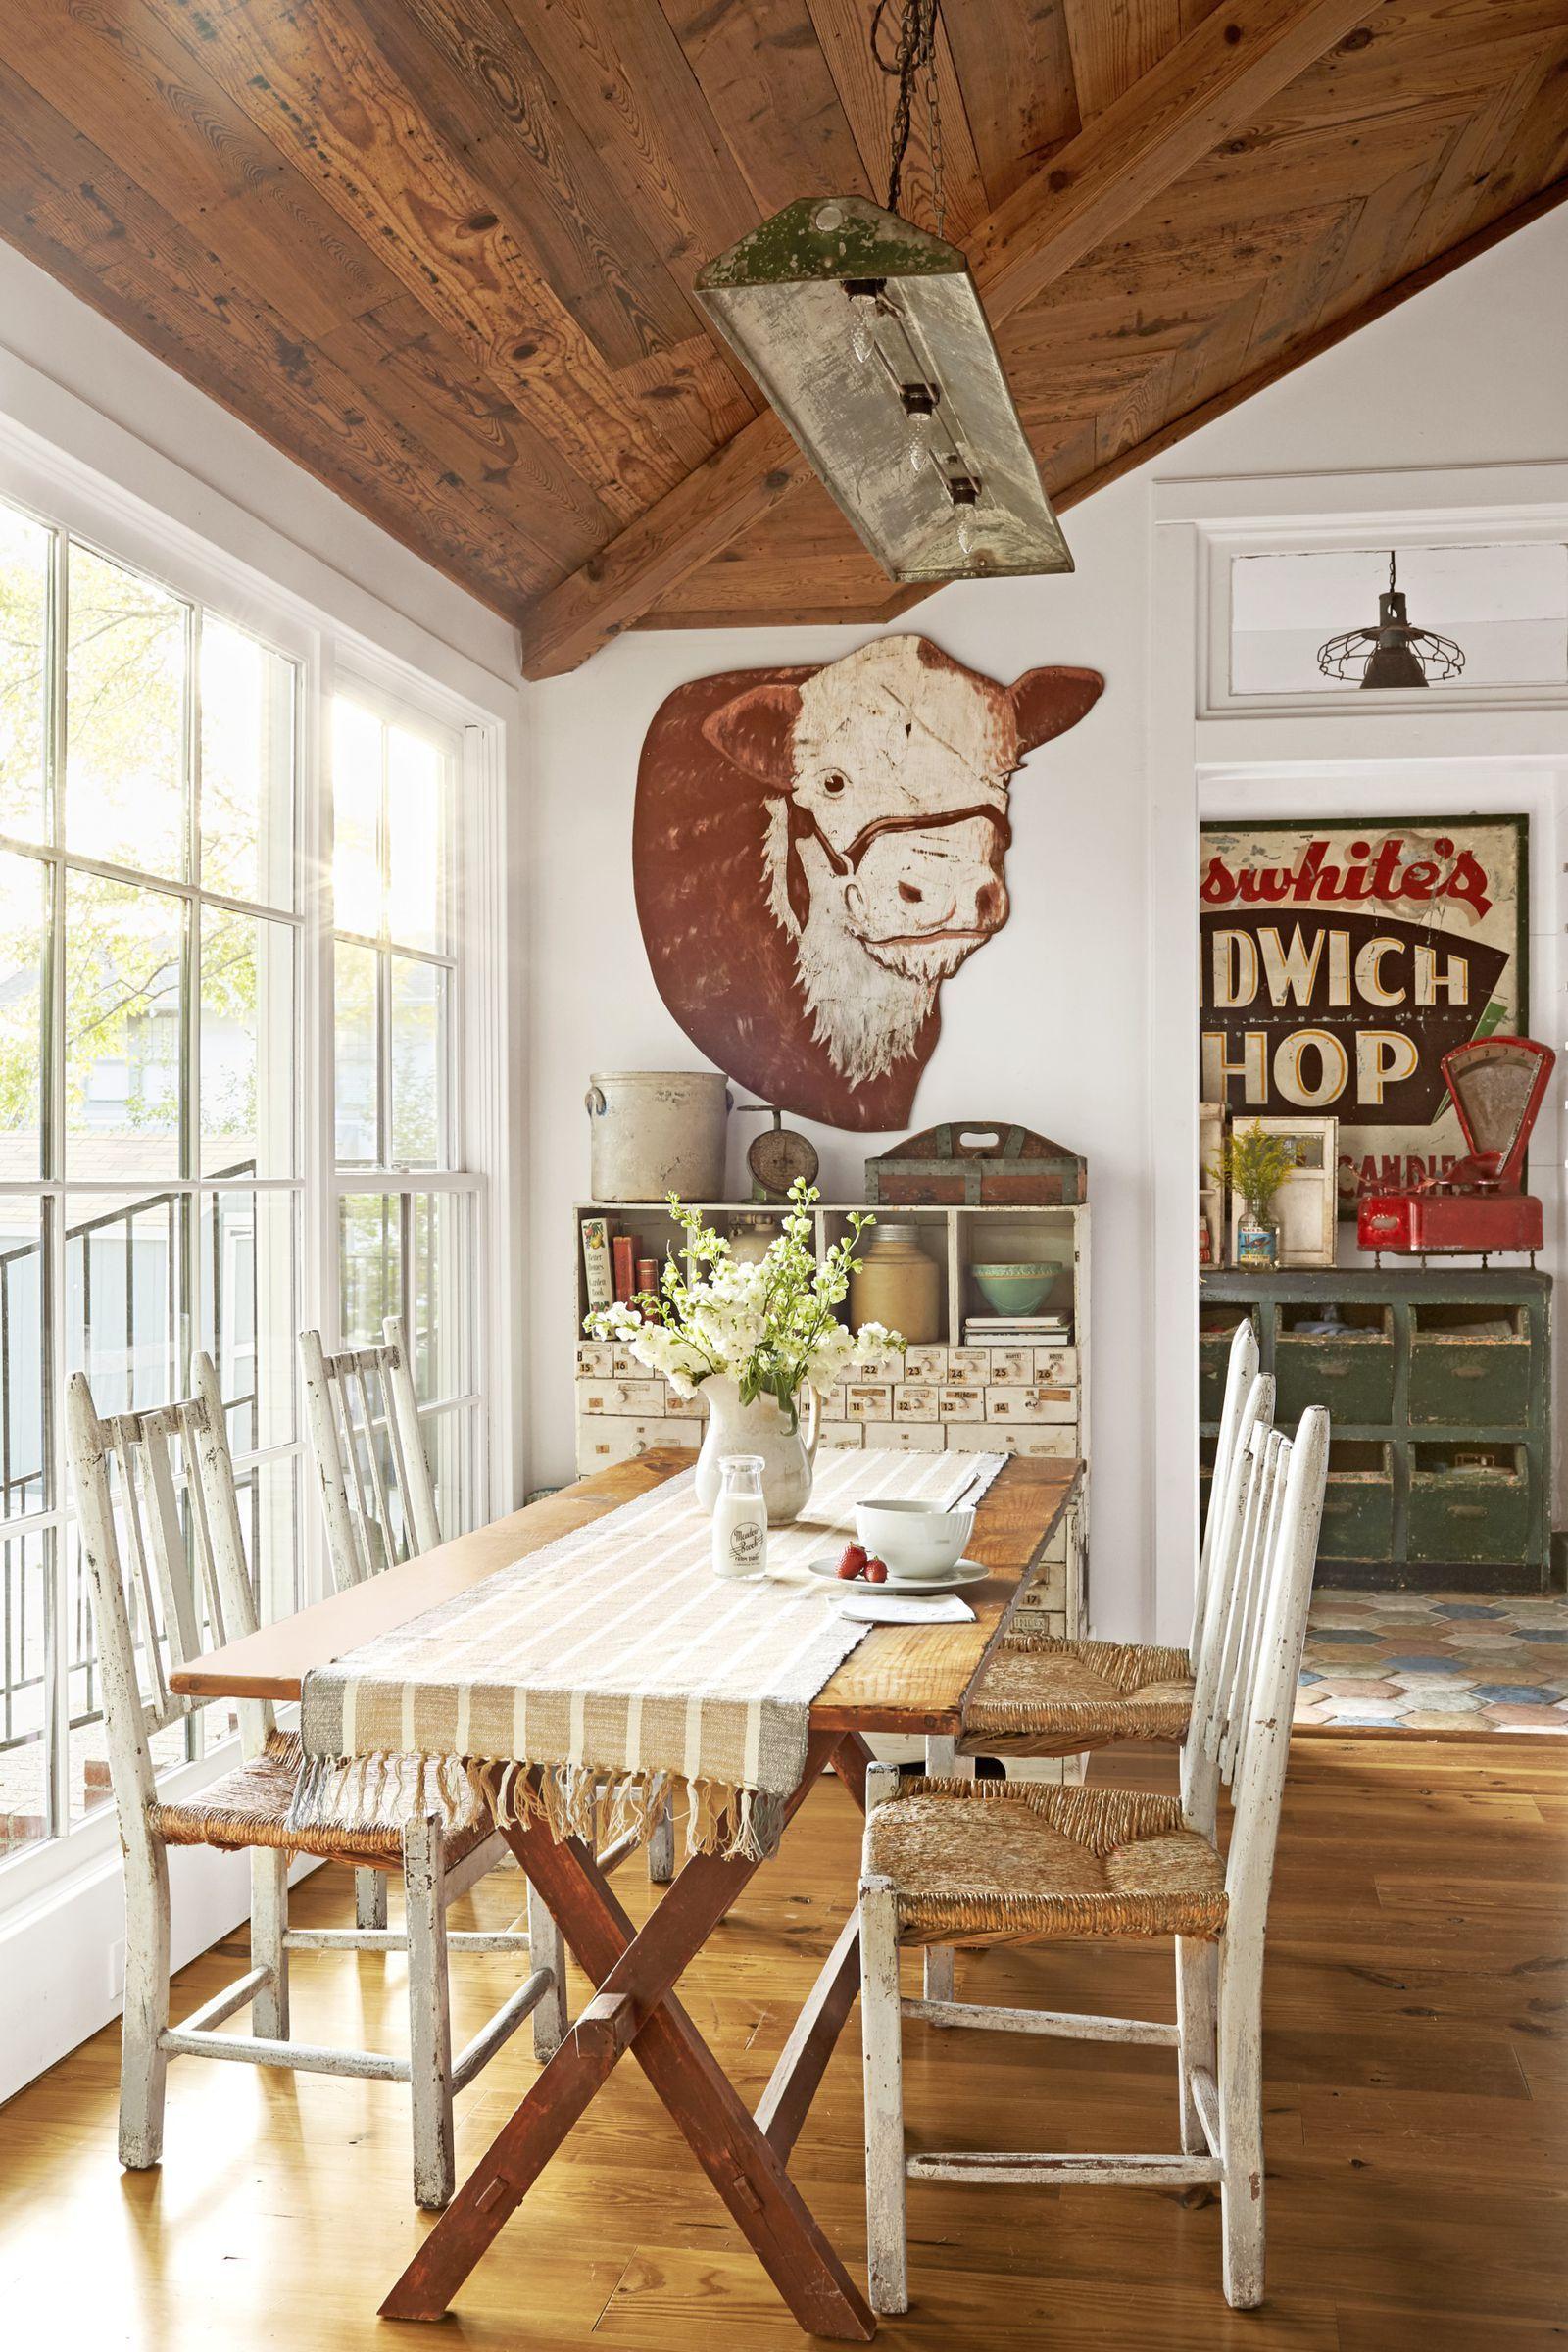 27 Beautiful Ways To Decorate Your Farmhouse For Spring Country House Decor Country Farmhouse Decor Vintage Farmhouse Decor